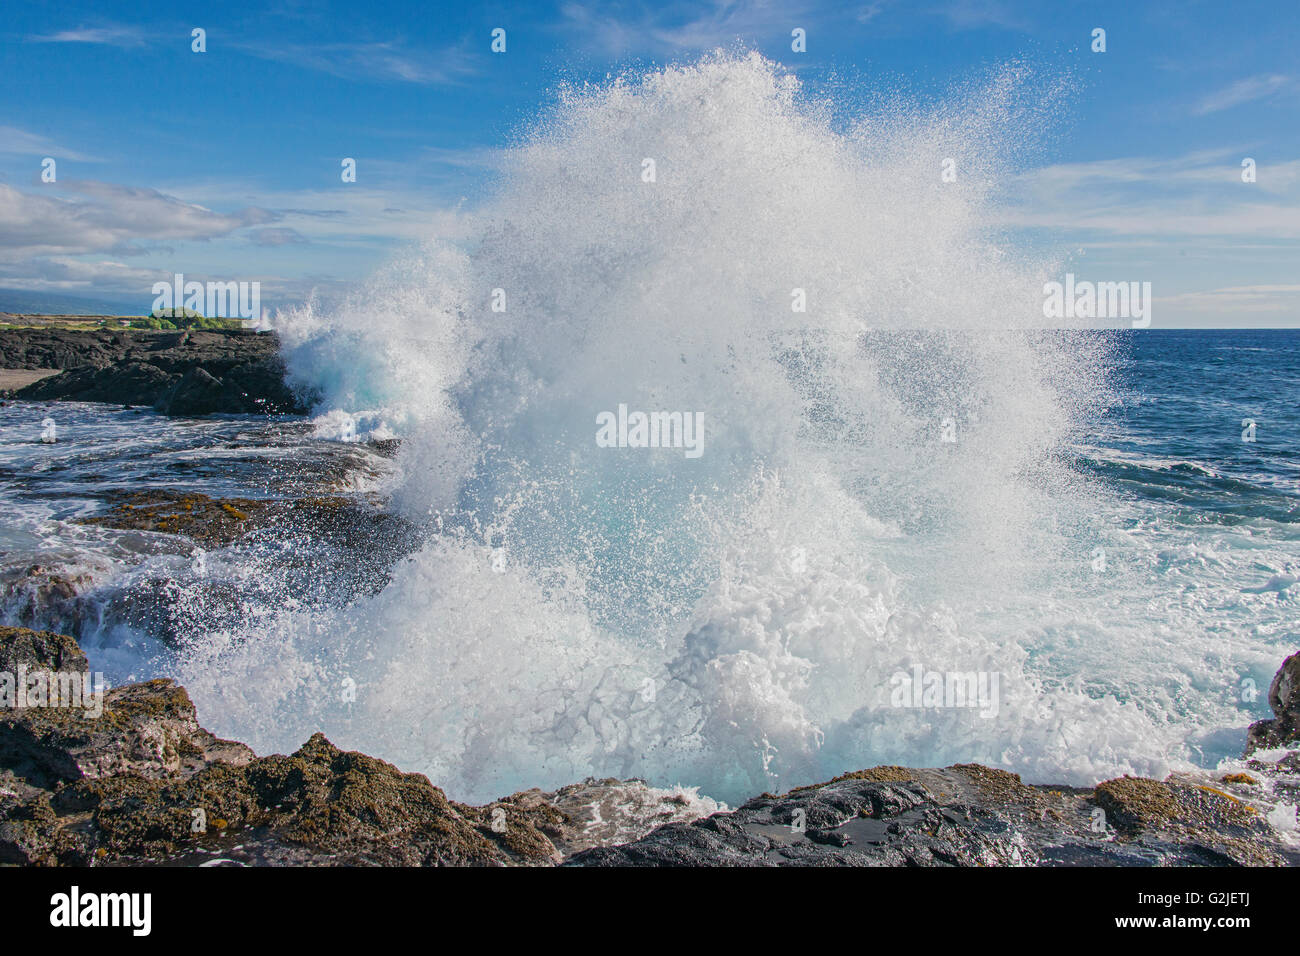 Pounding surf, Wawaloli Beach Park, Hawaii Island (Big Island). Hawaiian Islands, central Pacific Ocean, USA - Stock Image